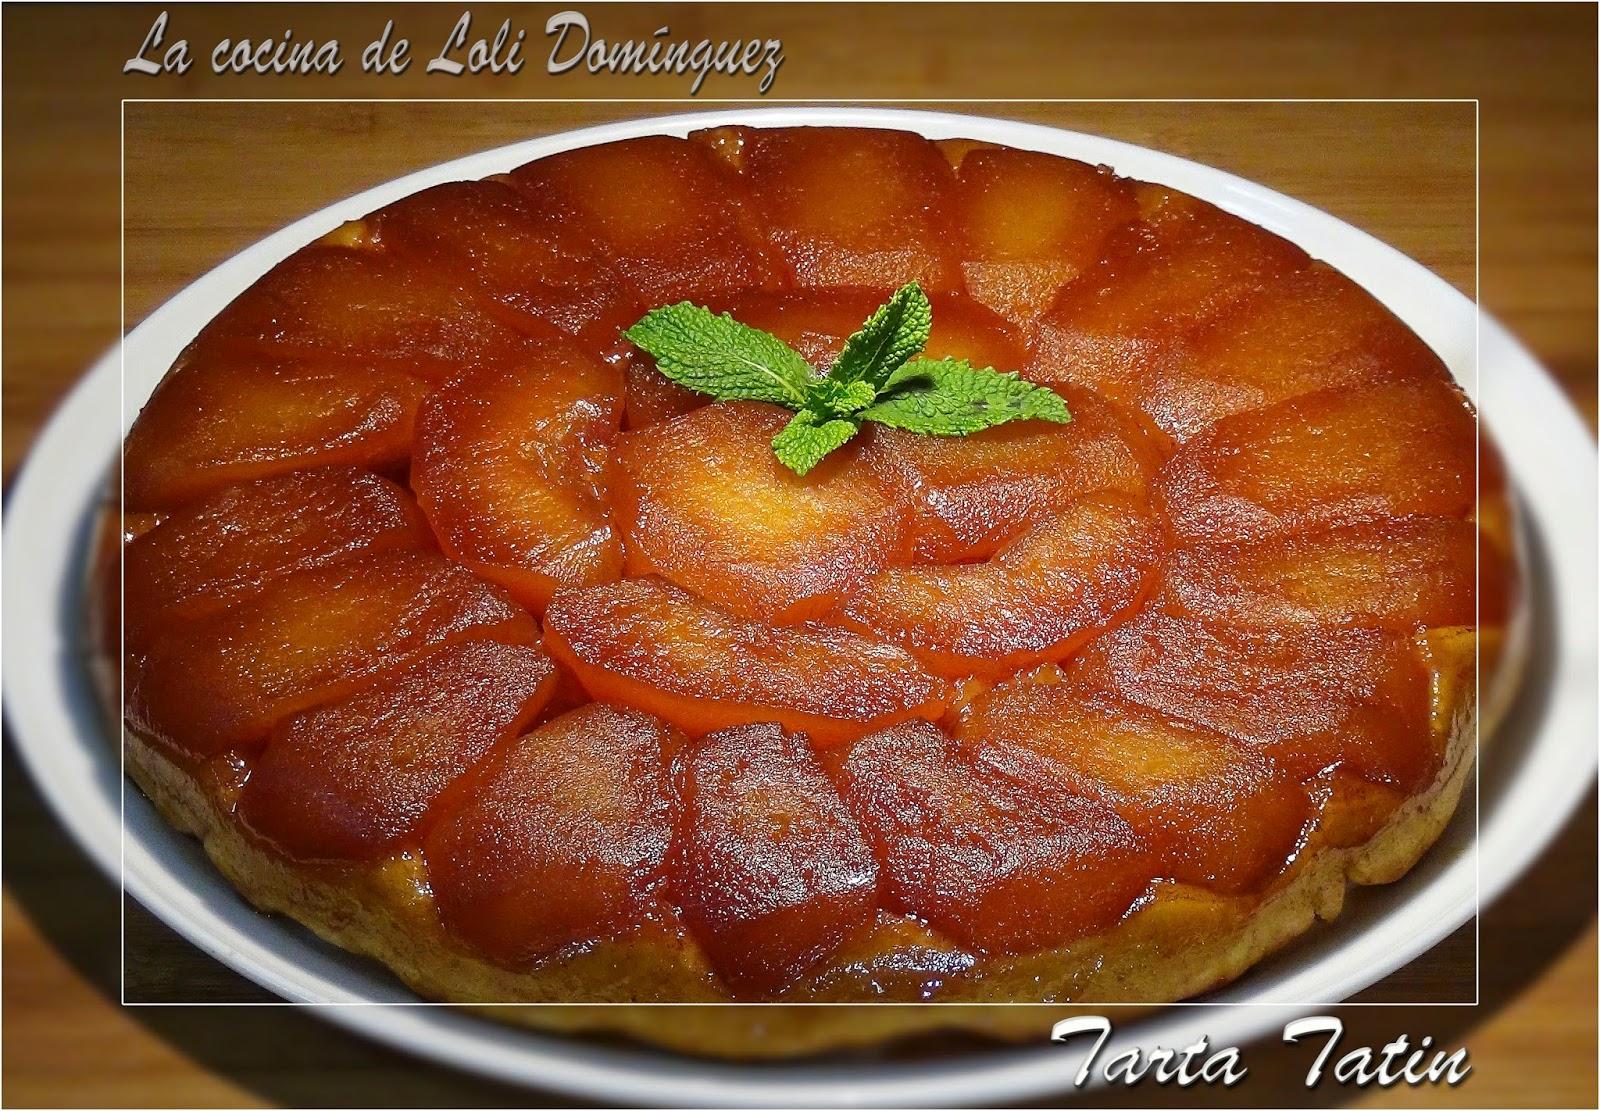 La cocina de loli dom nguez tarta tatin for La cocina de seve